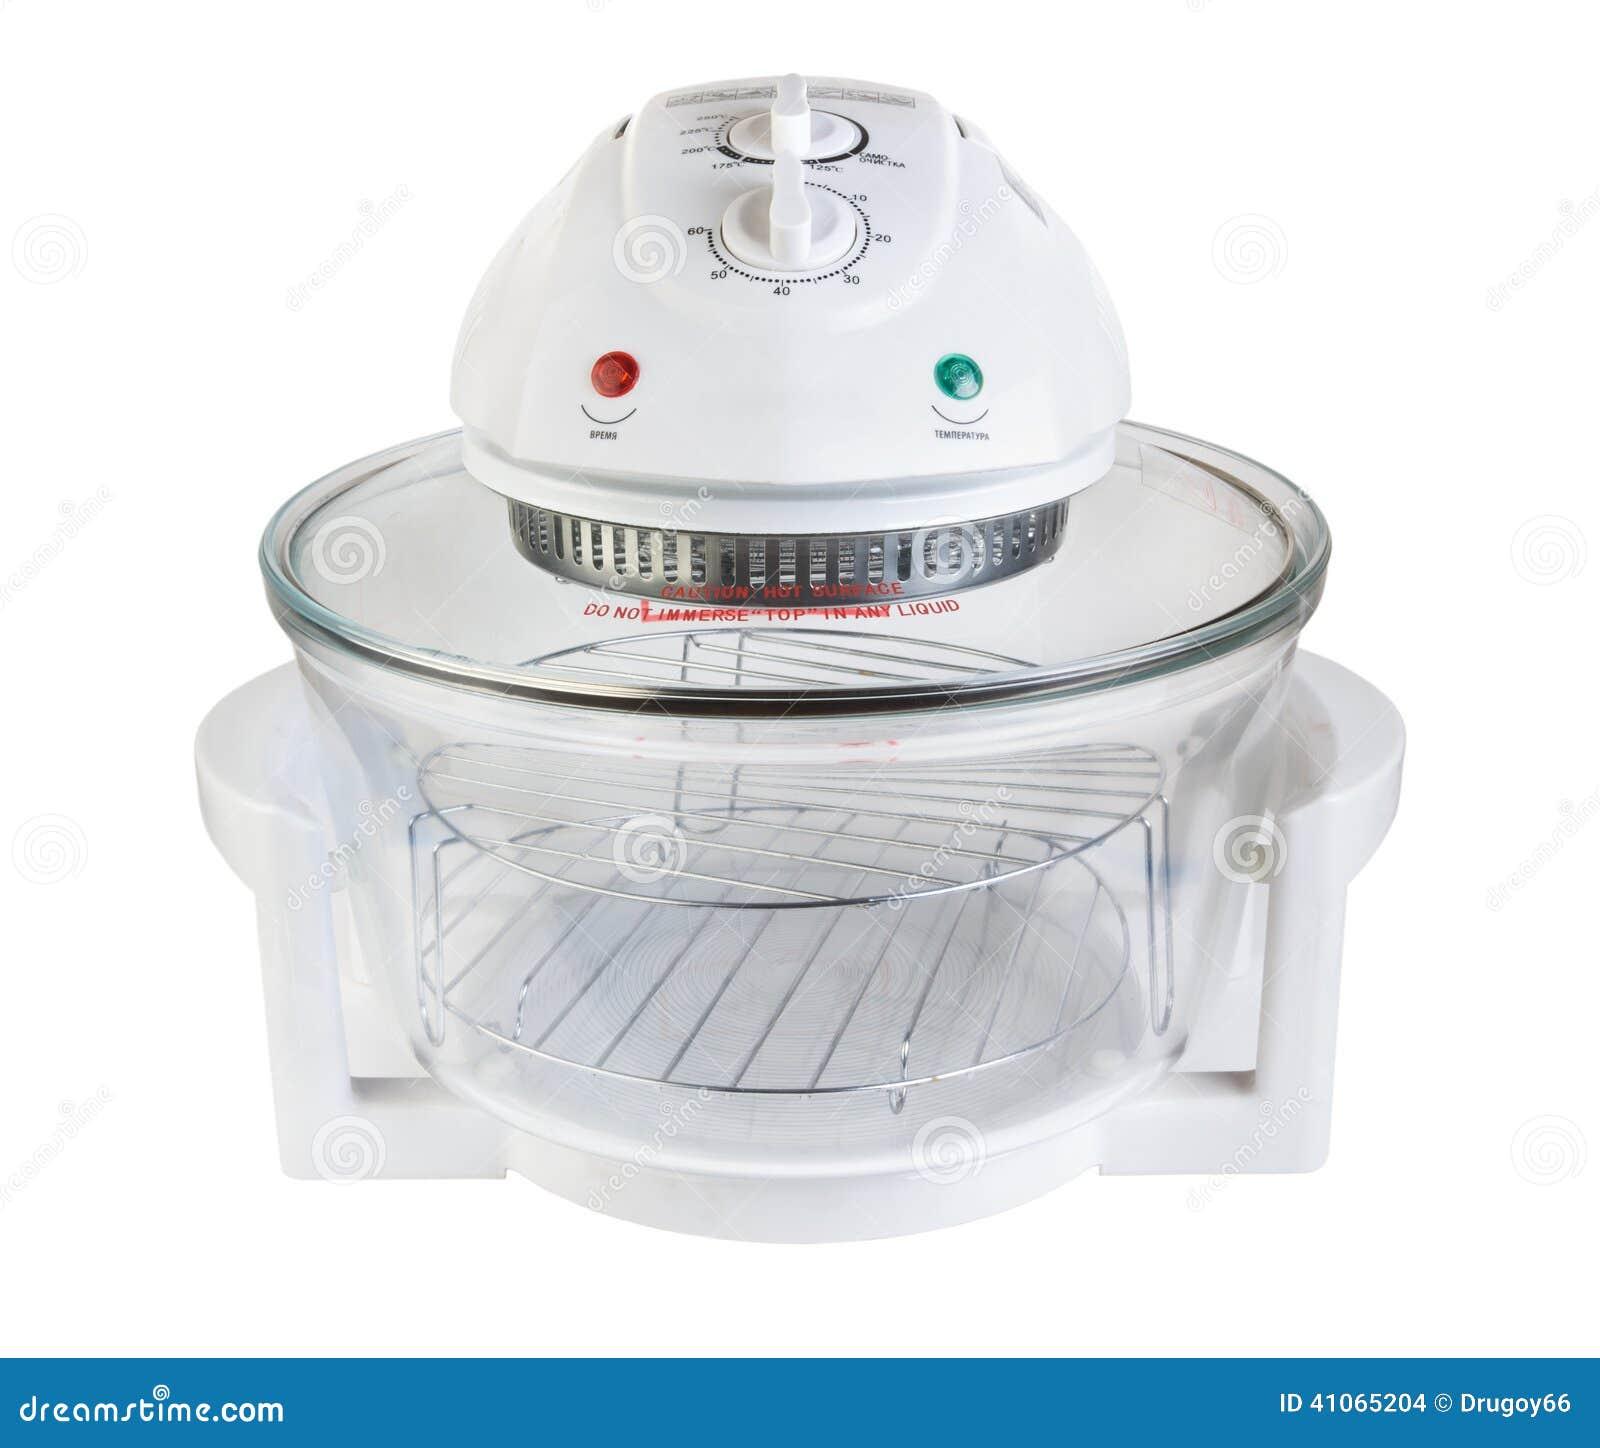 Electric Kitchen Appliances : Electric Kitchen Appliance - Aerogrill Stock Photo - Image: 41065204